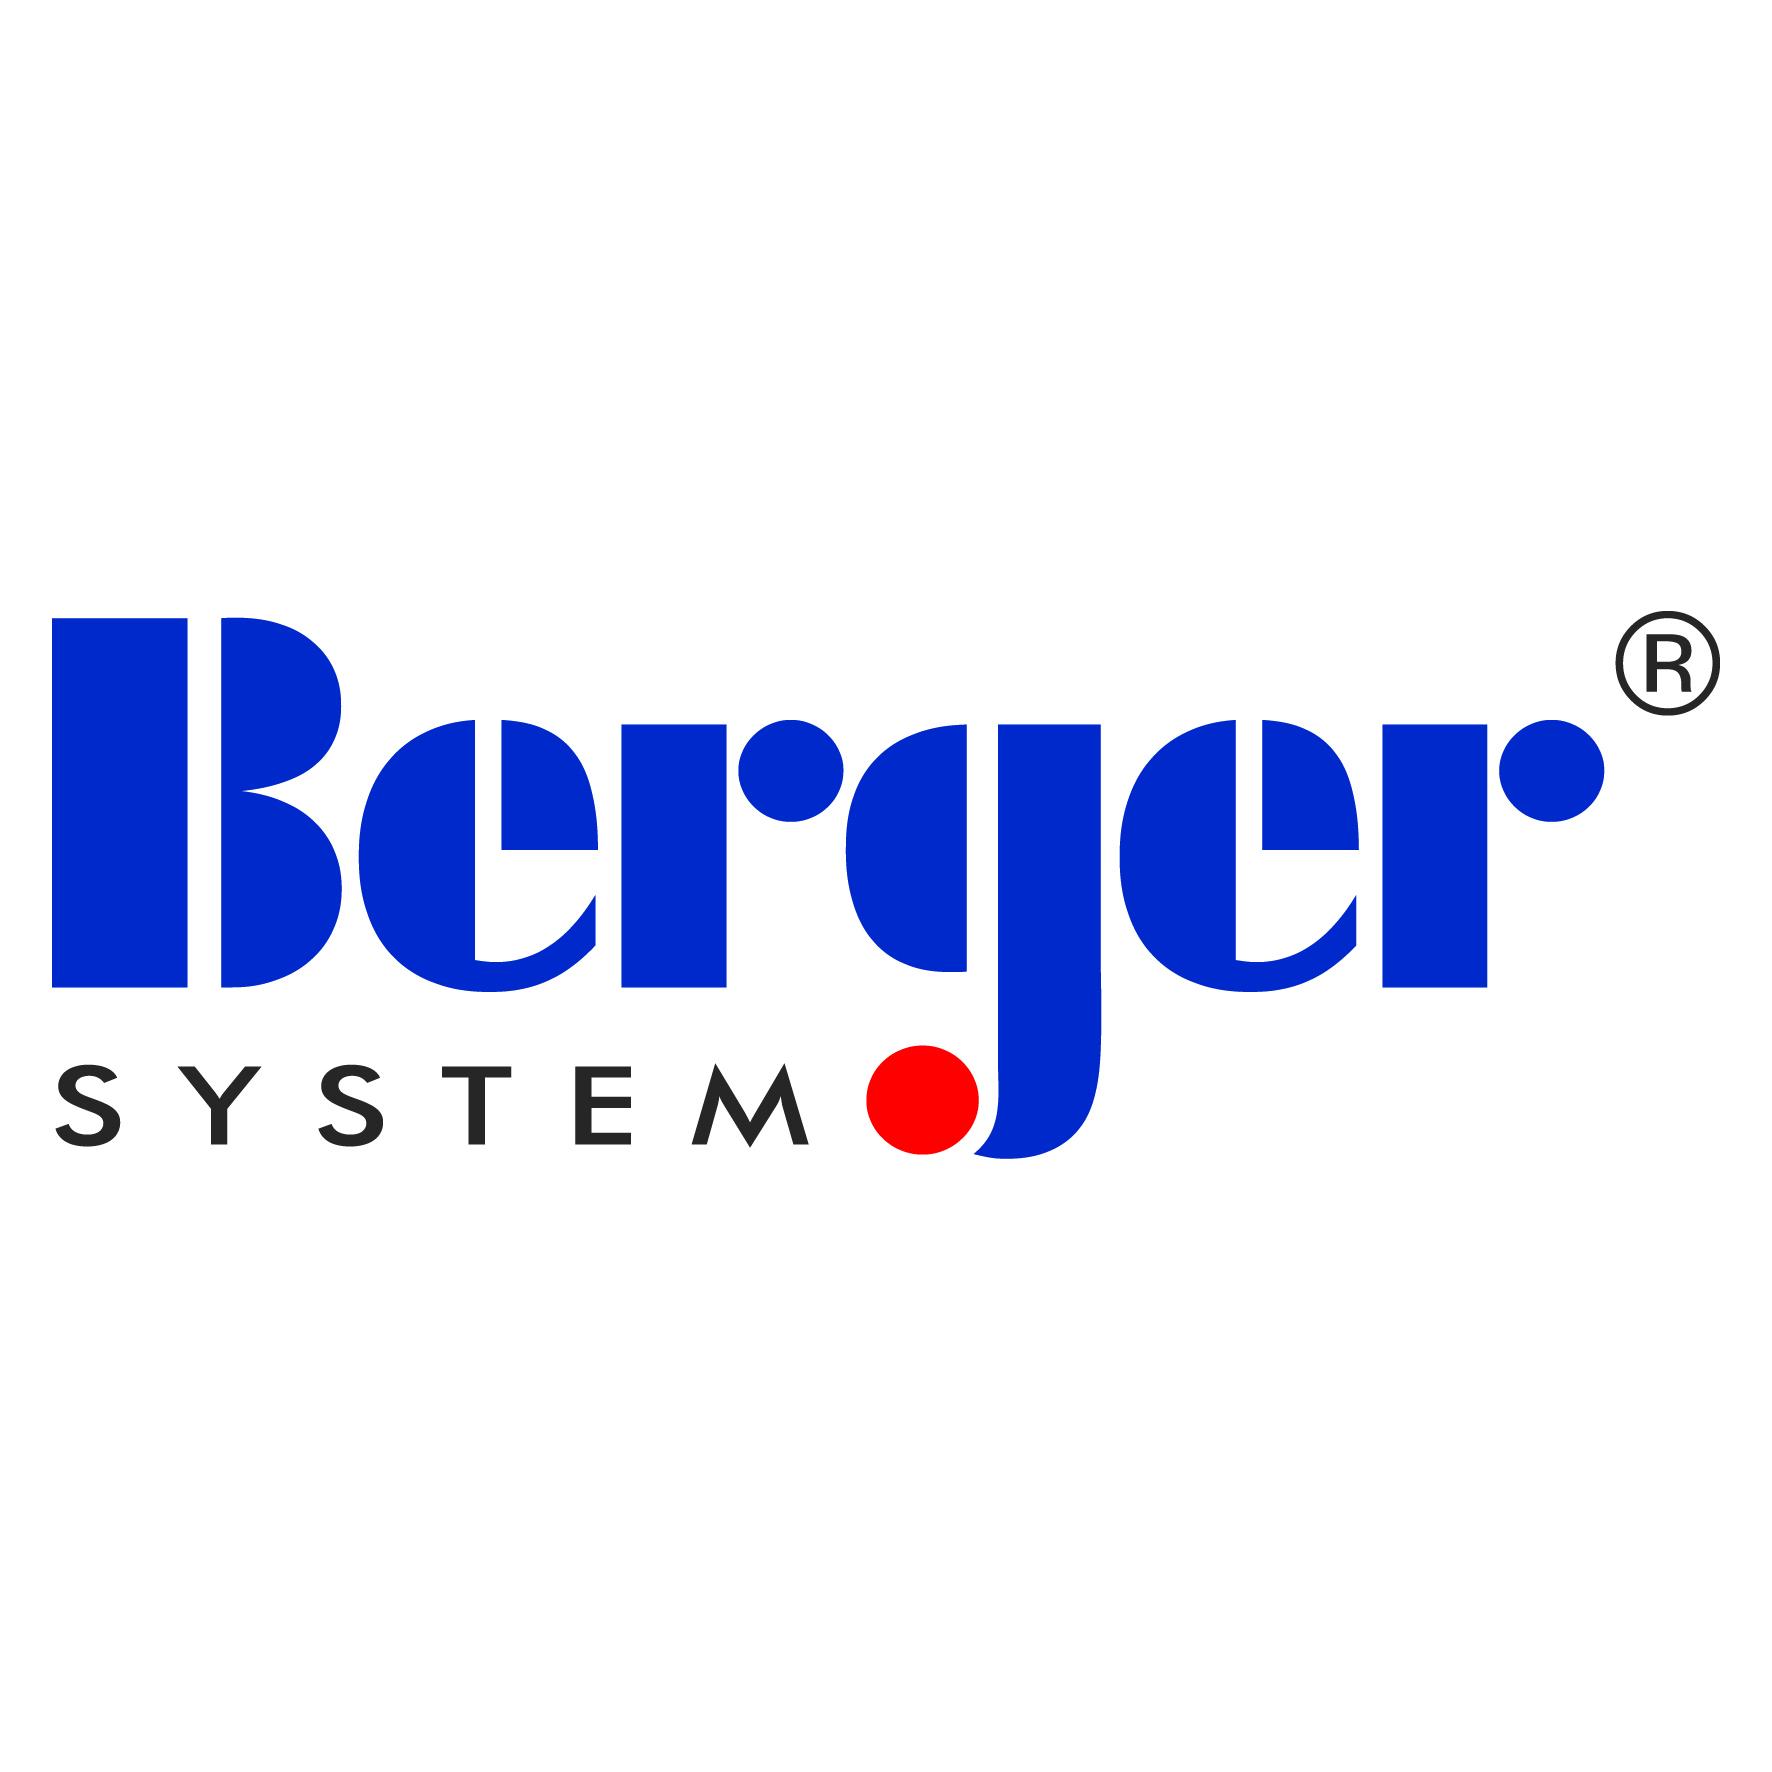 Berger logo - Marktplatz